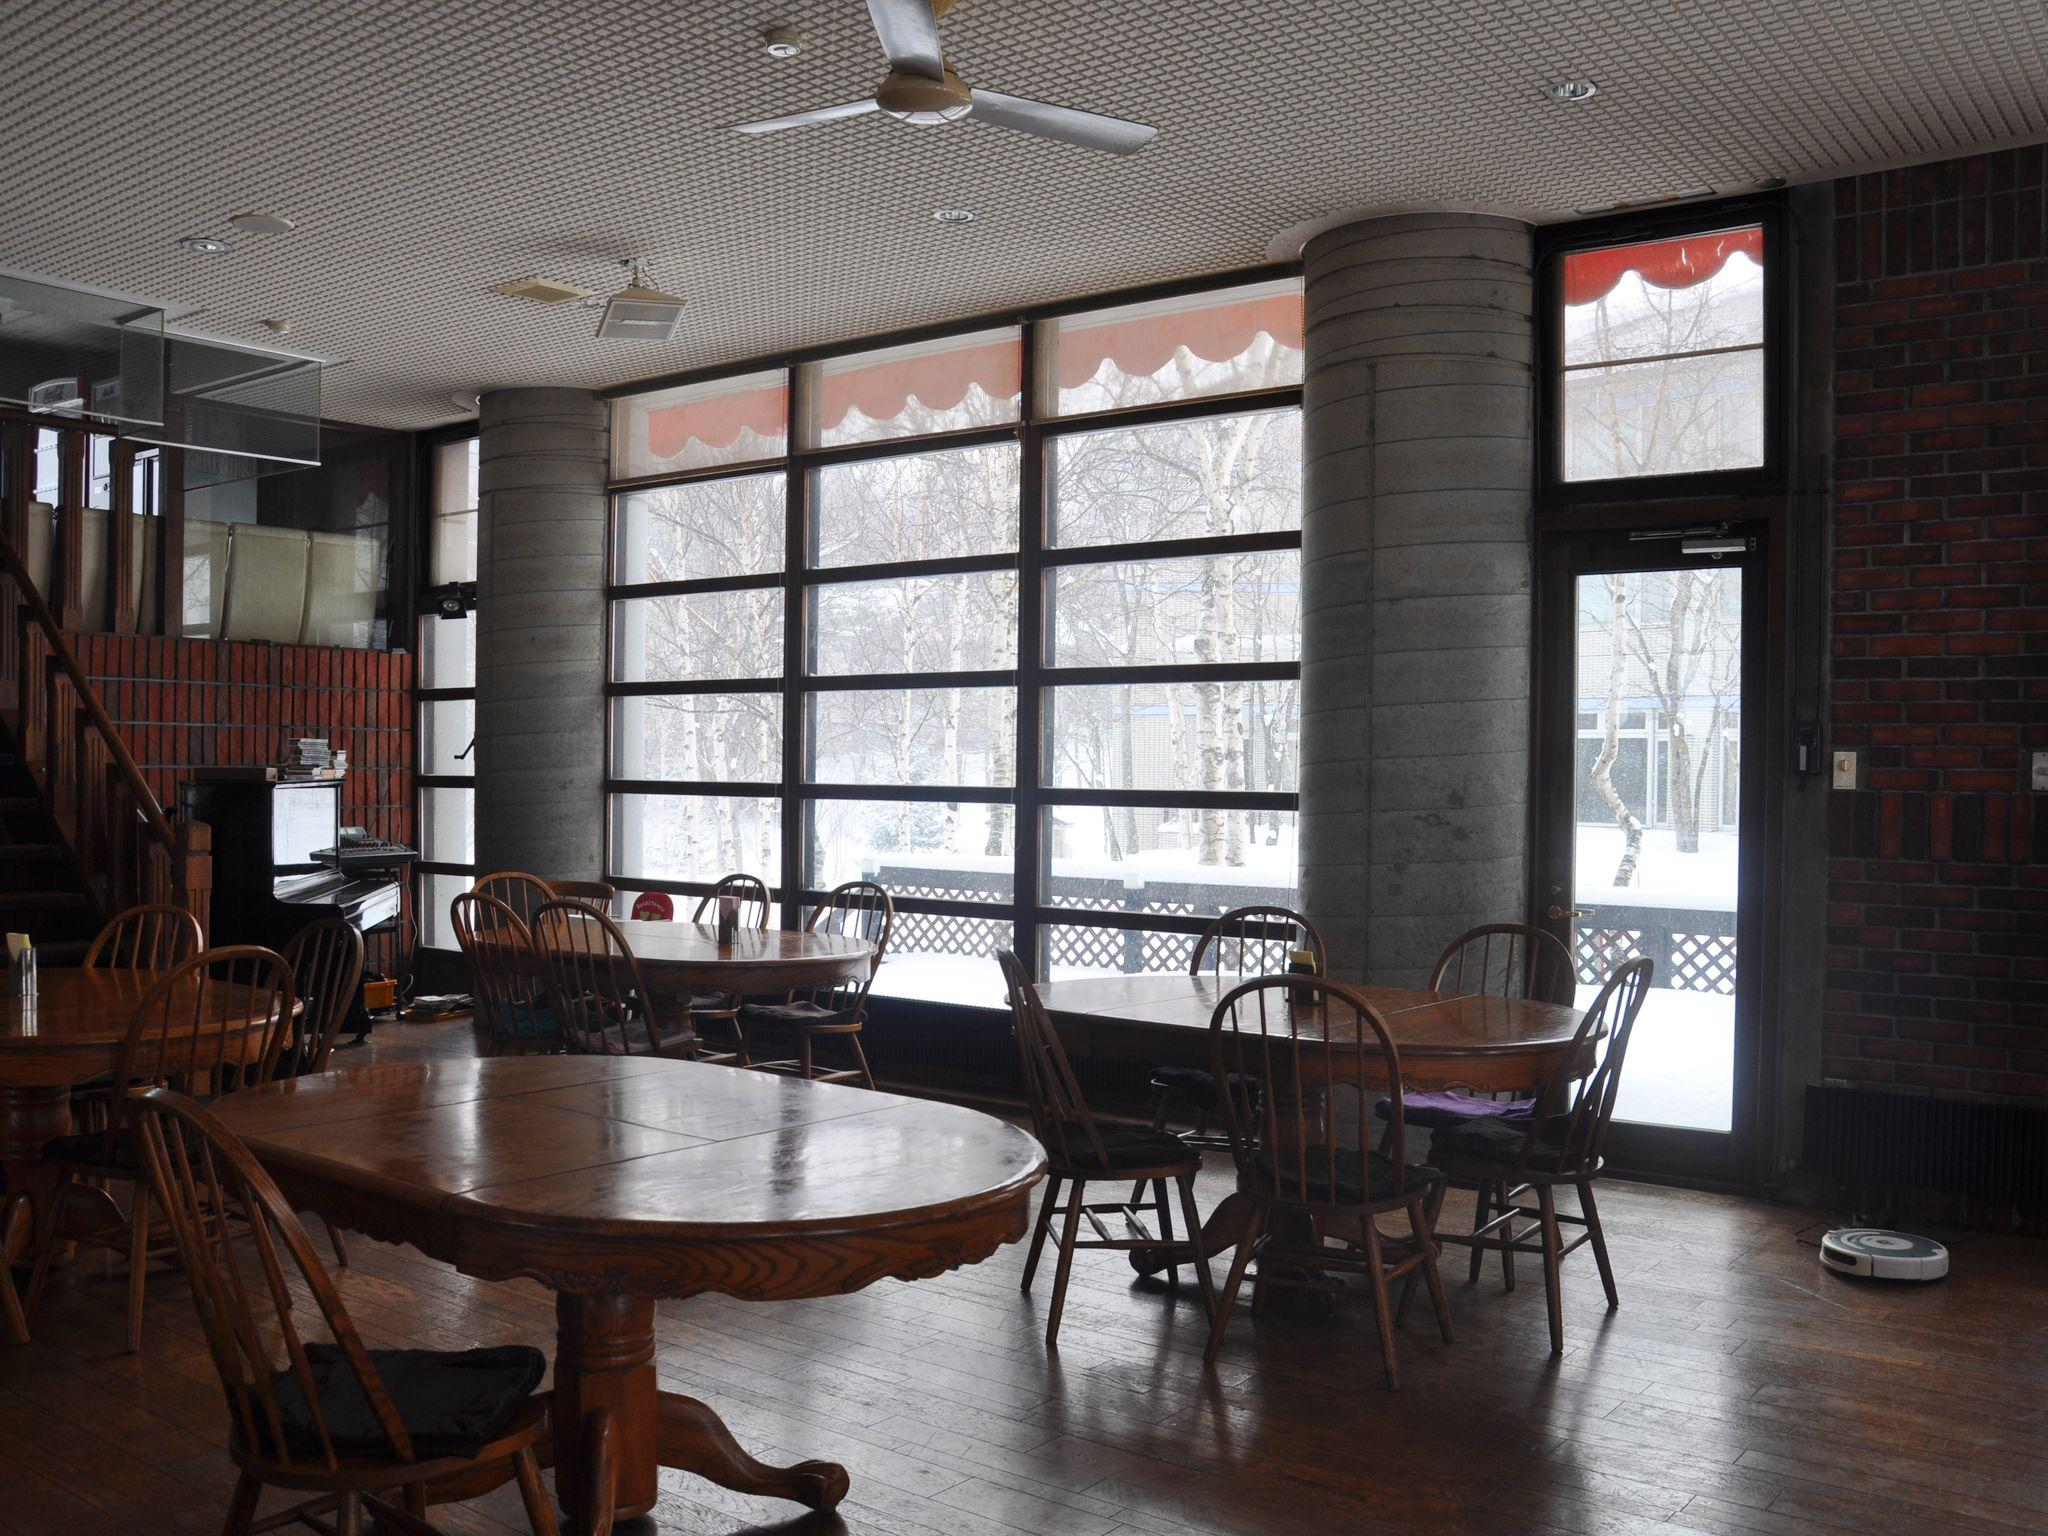 Pension Appi Kogen Rocky inn, Hachimantai